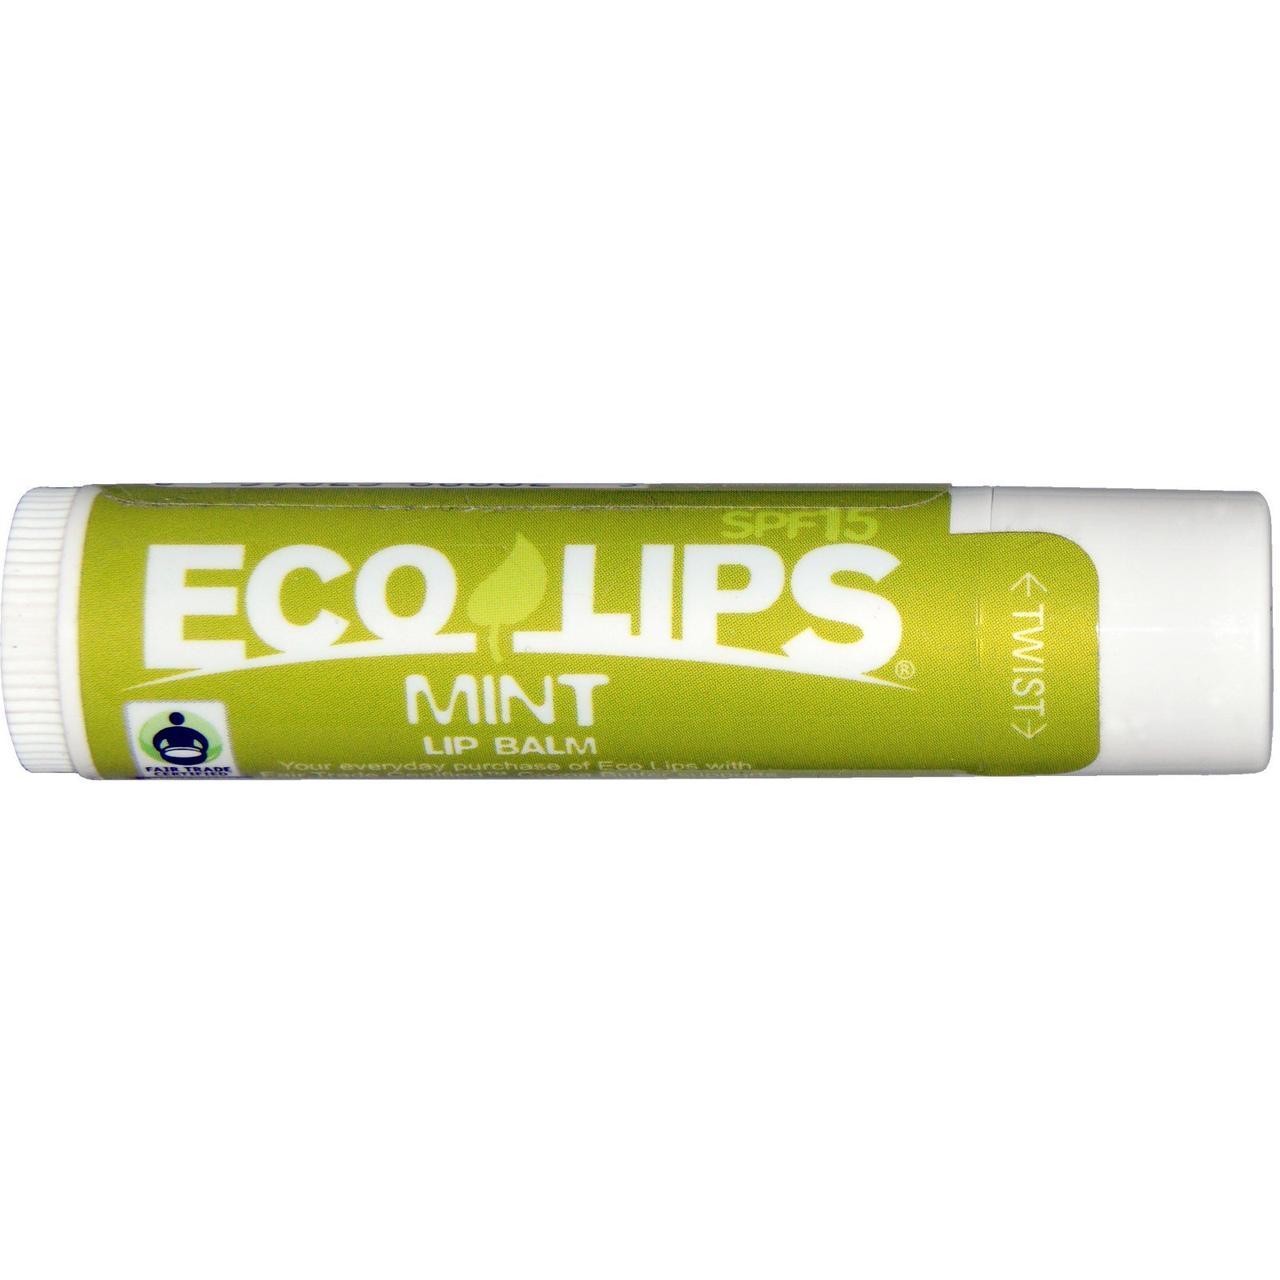 Eco Lips Inc., Бальзам для губ, SPF 15, Мята, 0.15 унций (4.25 г)